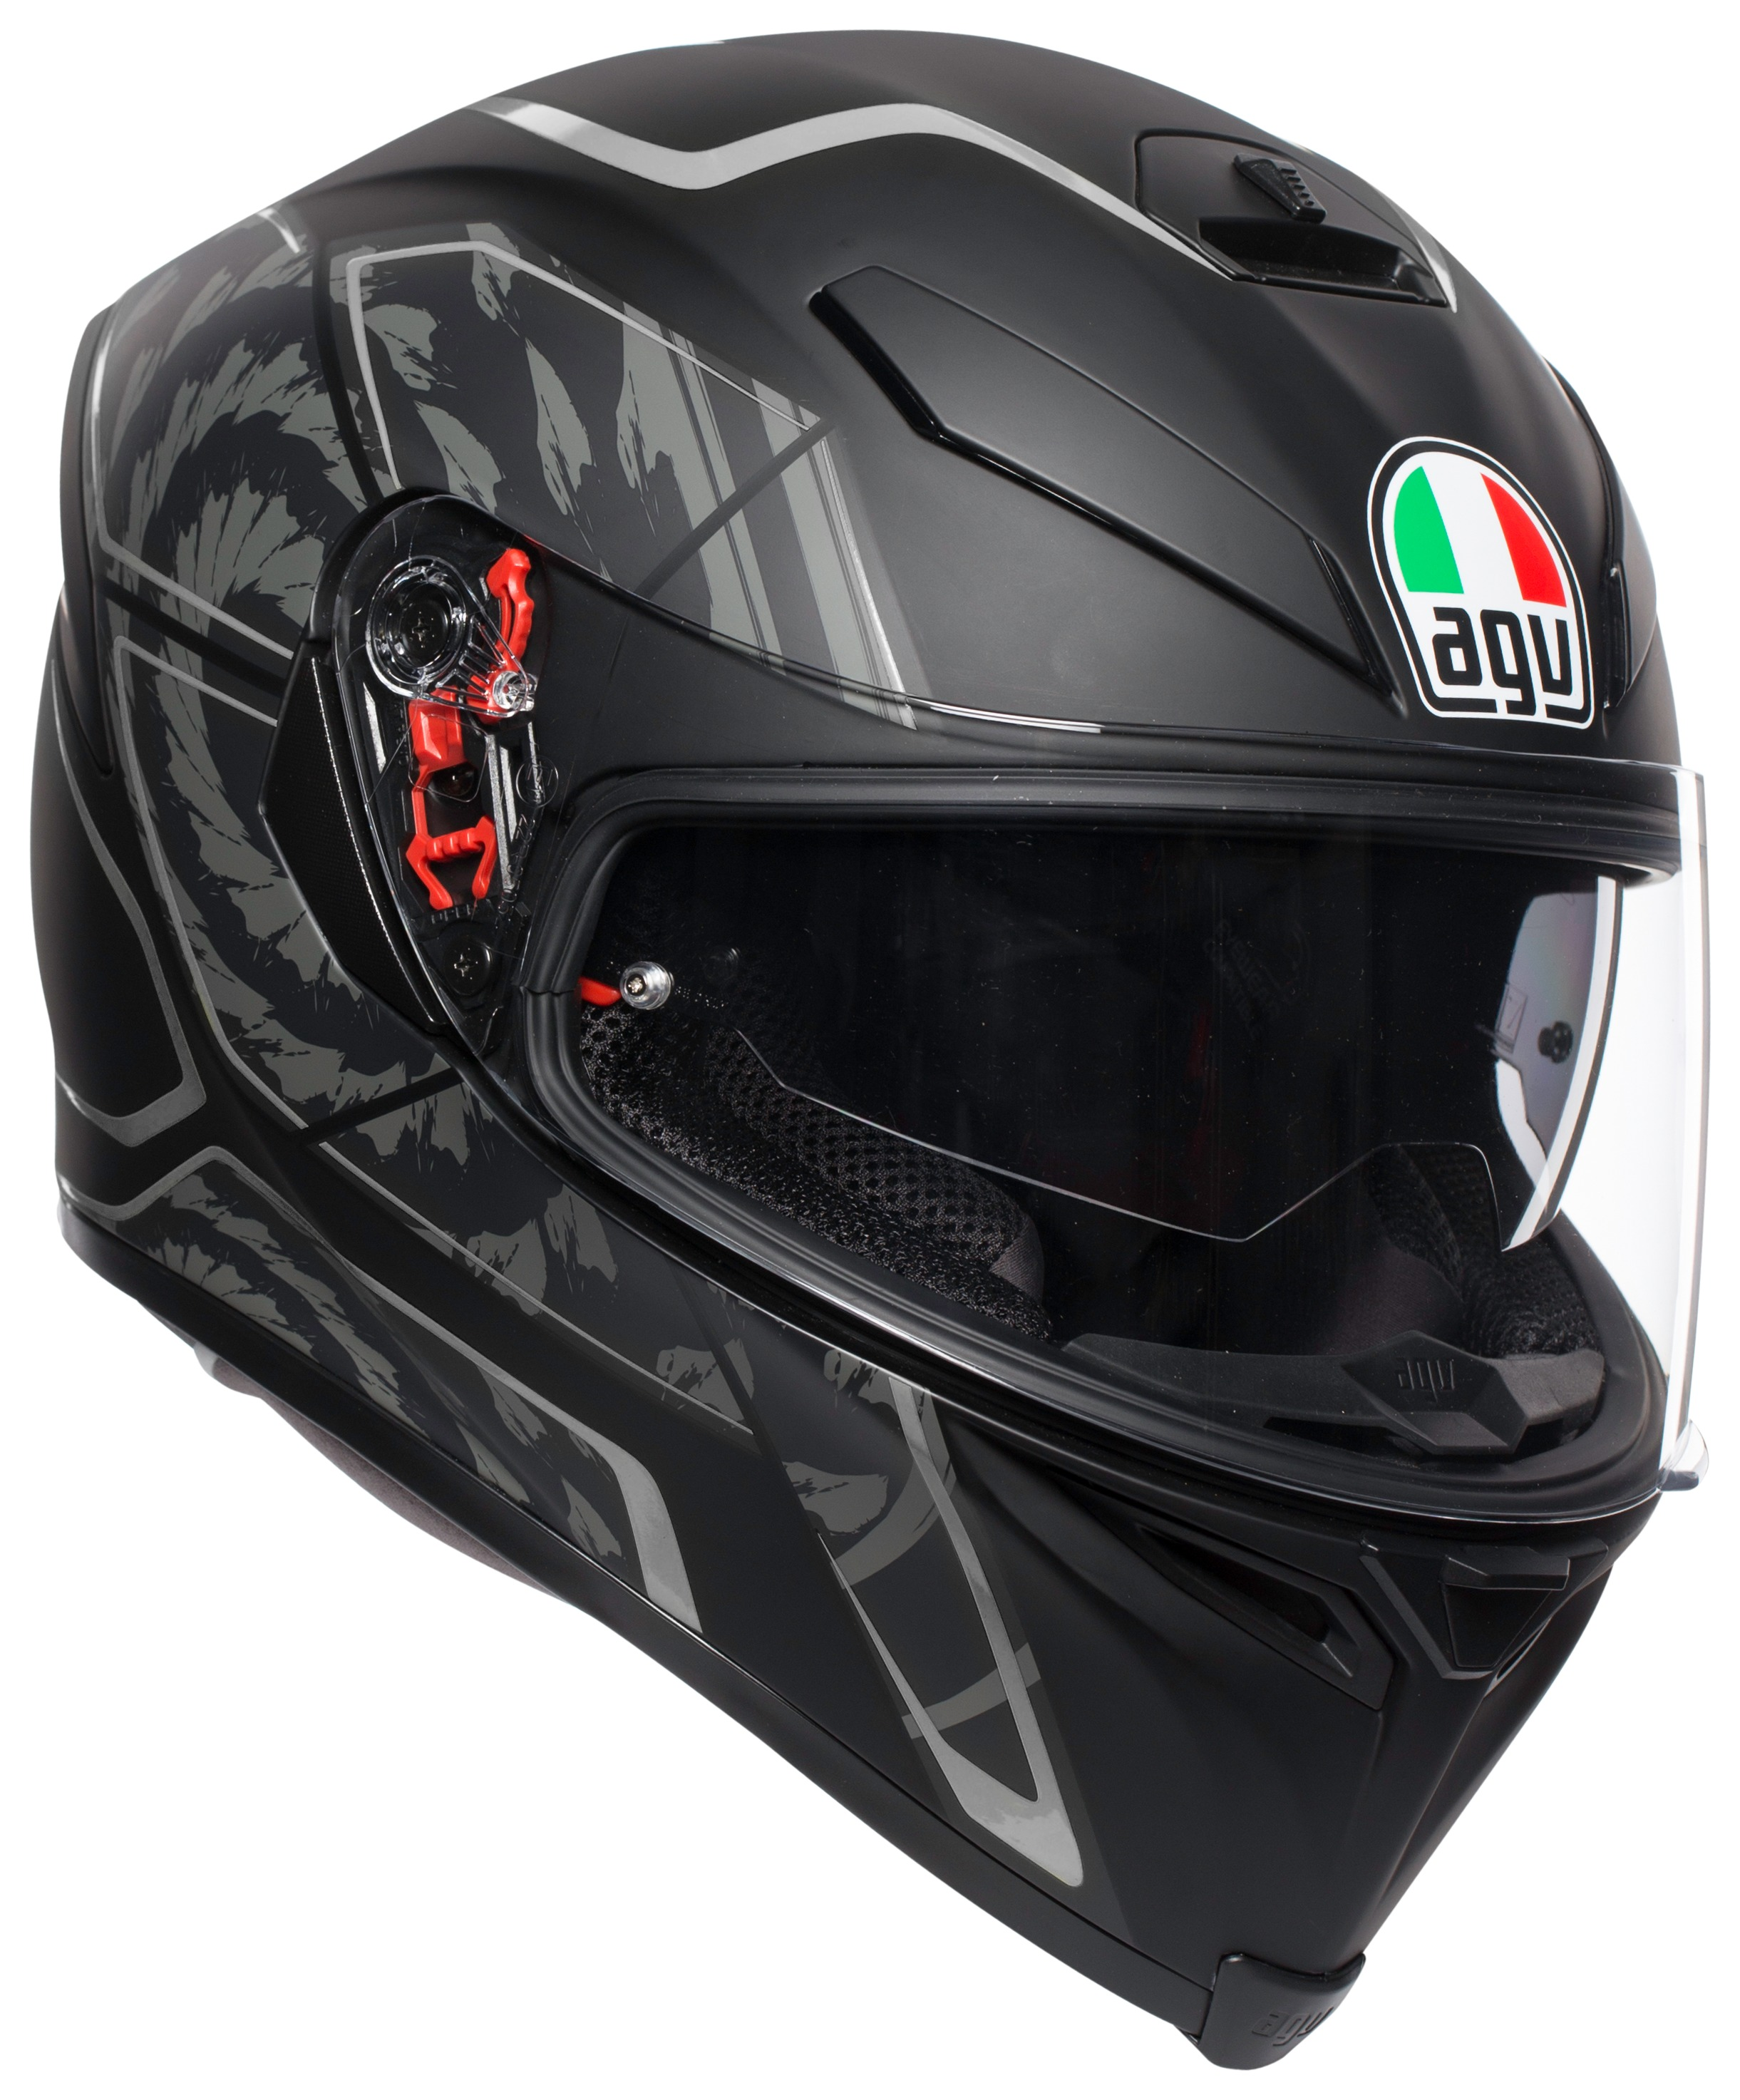 Silver//Large Snow Master Helmets TX-50-Silver Snow Master TX-50 Silver Modular Dual Use Snowmobile and Street Helmet